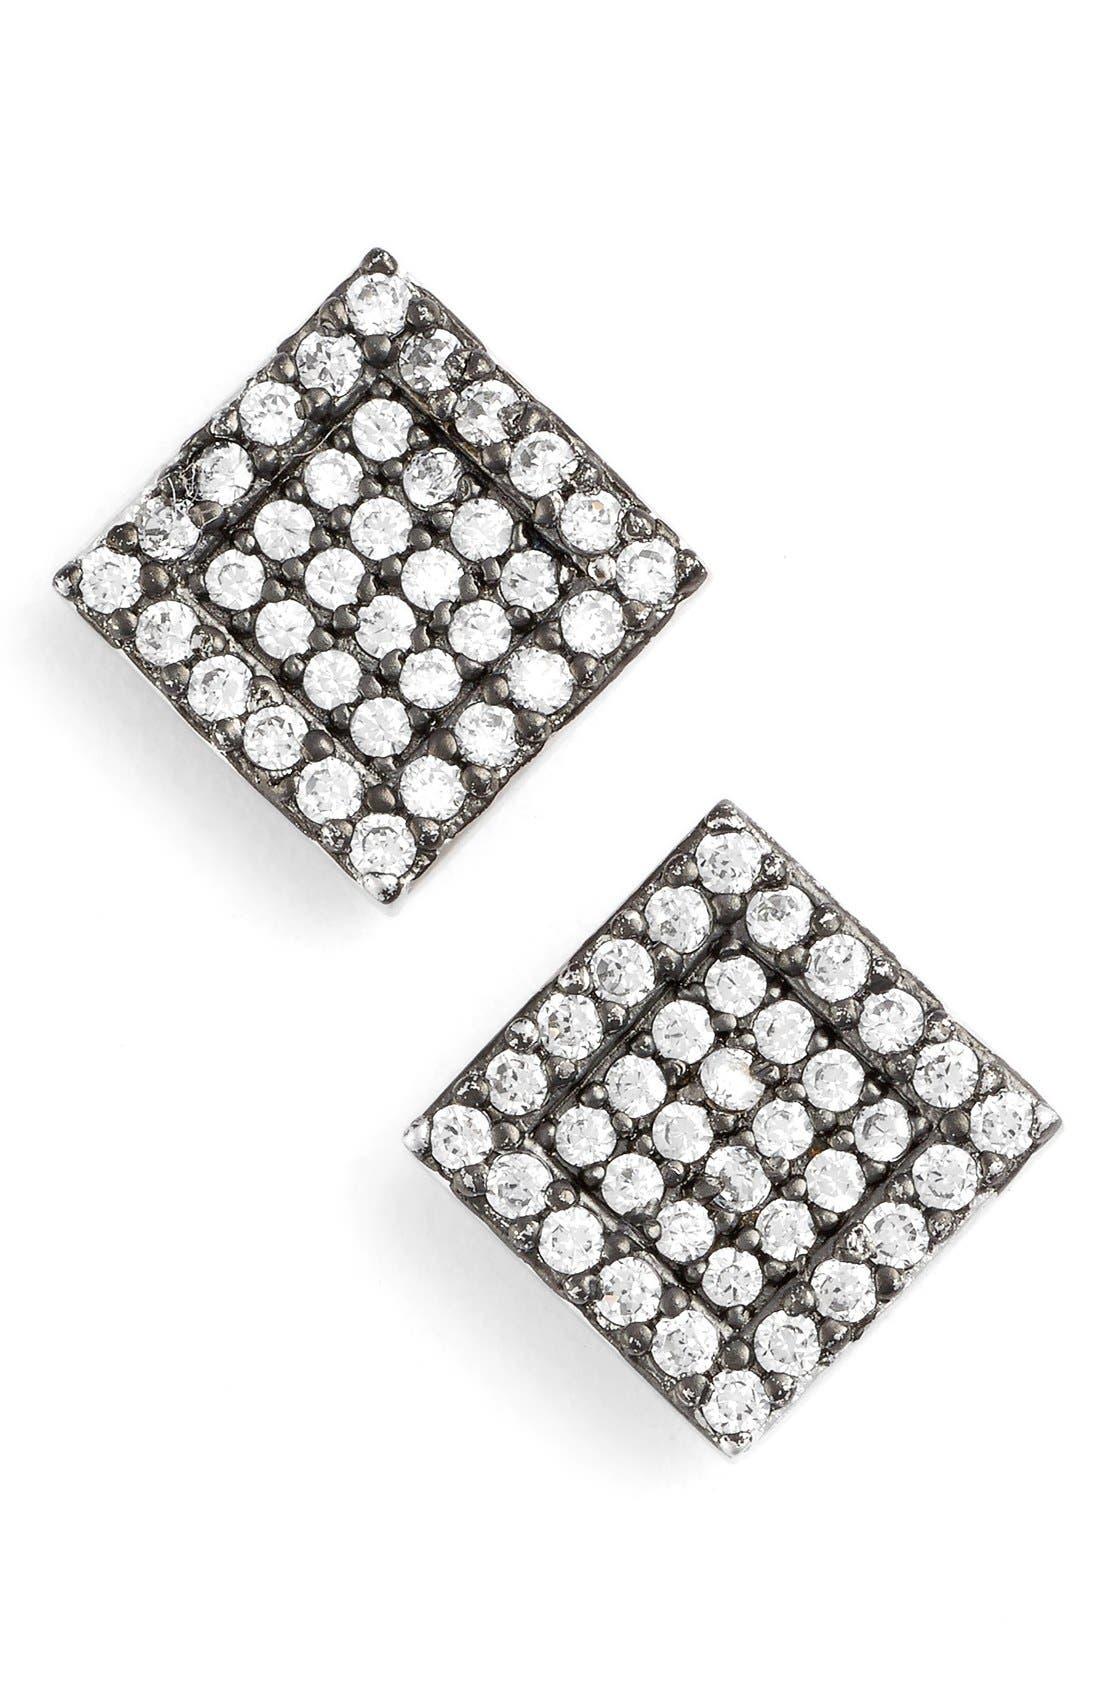 Main Image - FREIDA ROTHMAN 'Femme' Square Stud Earrings